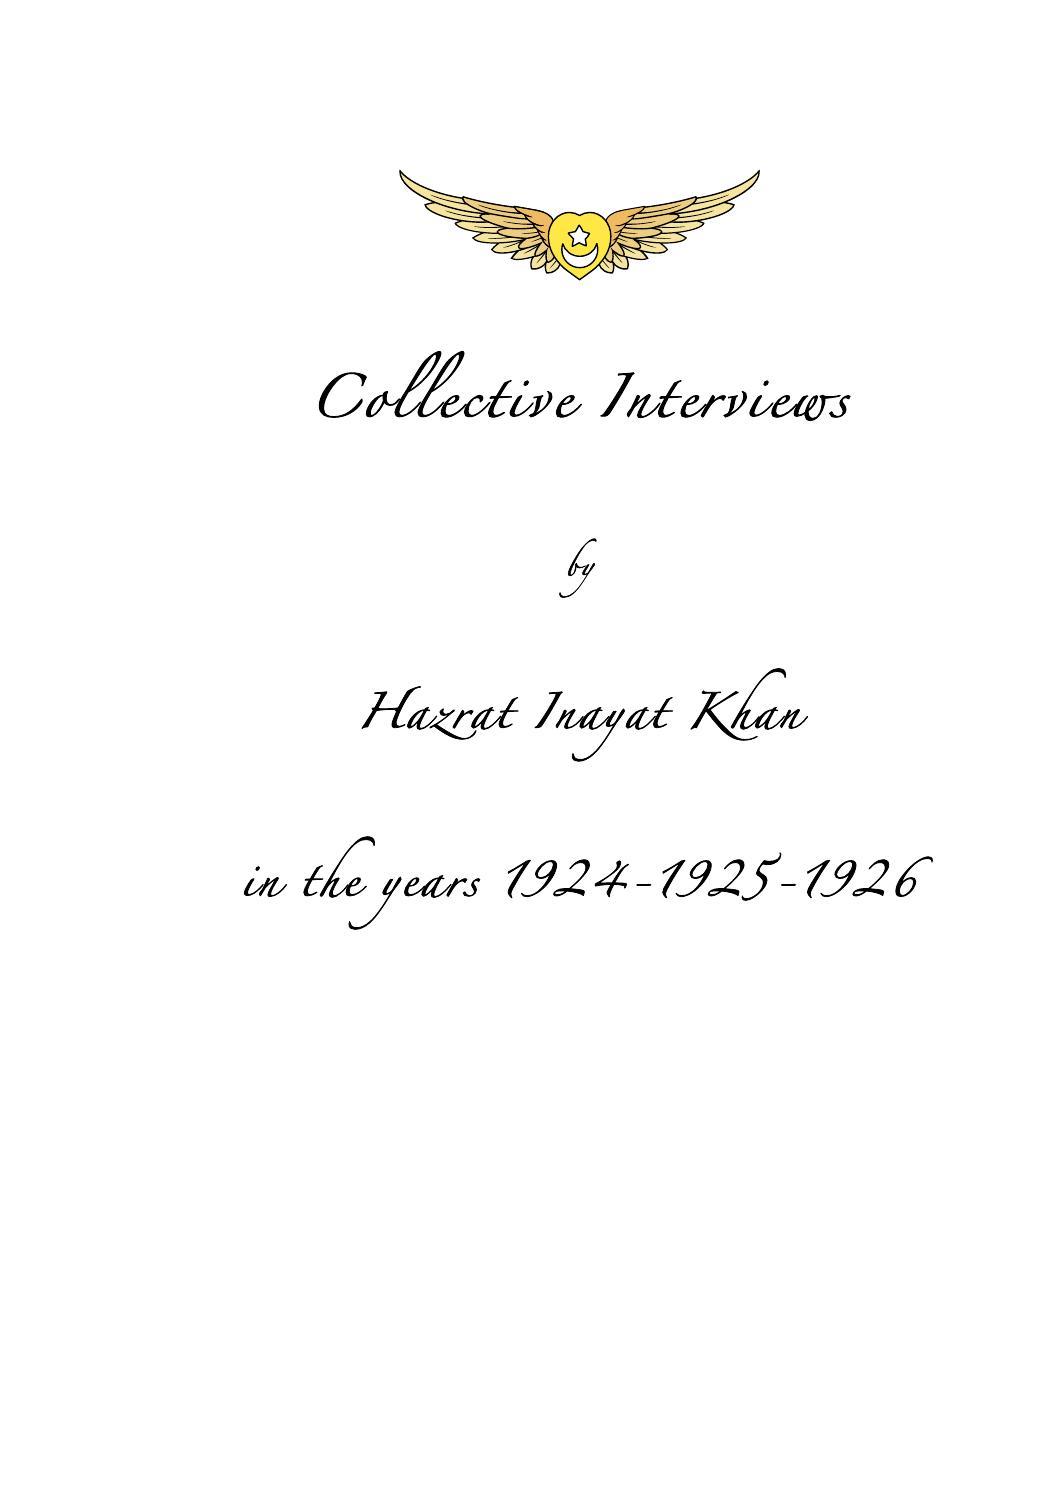 Collective interviews 1924 1926 by soefi beweging nederland